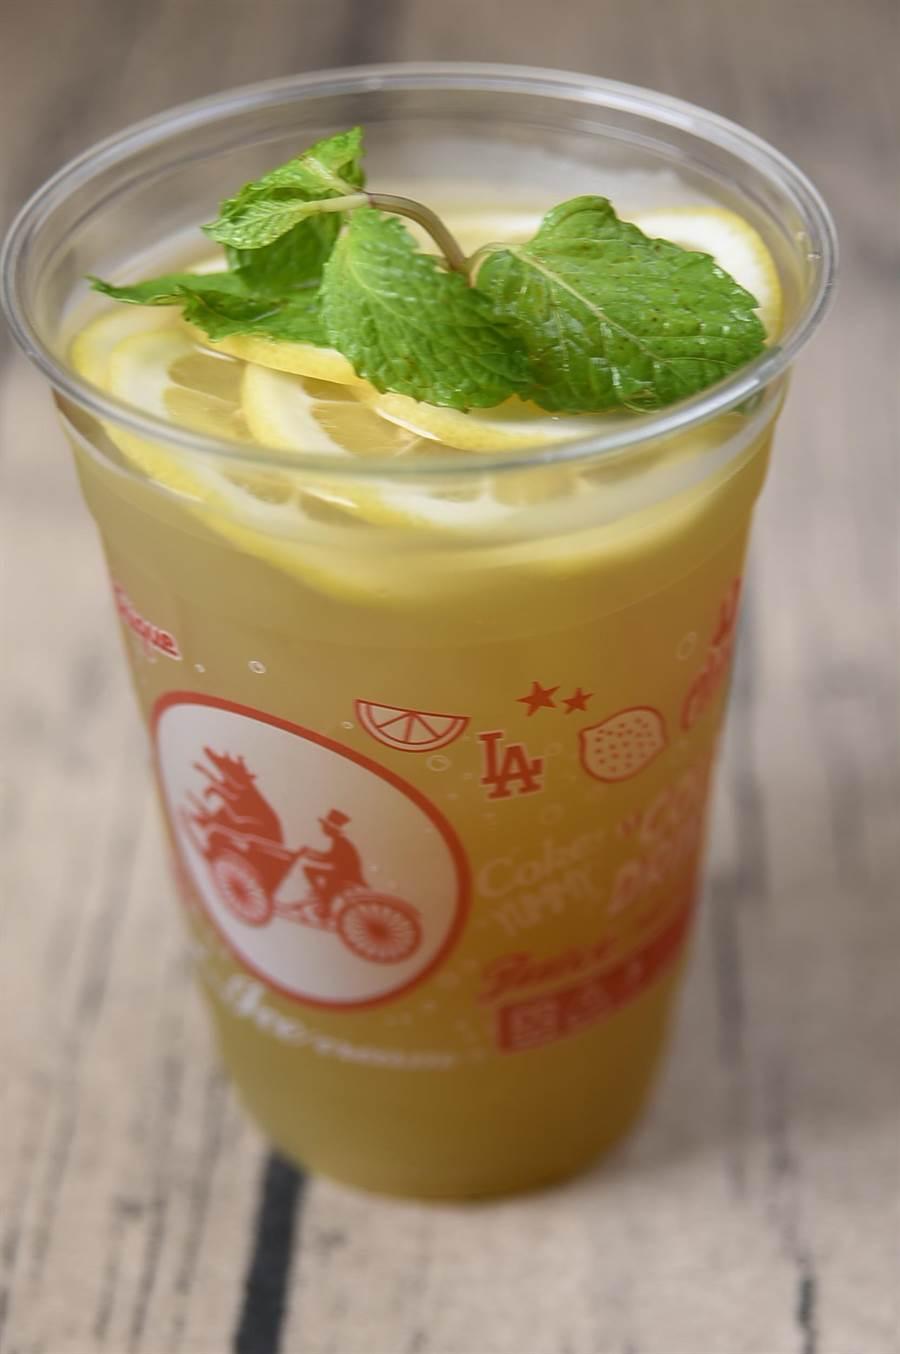 〈CYCLO洛城牛肉粉〉的〈甘蔗汁〉,是將產自埔里的紅甘蔗榨成汁,再煮過冷凍,甜而不膩。(圖/姚舜攝)